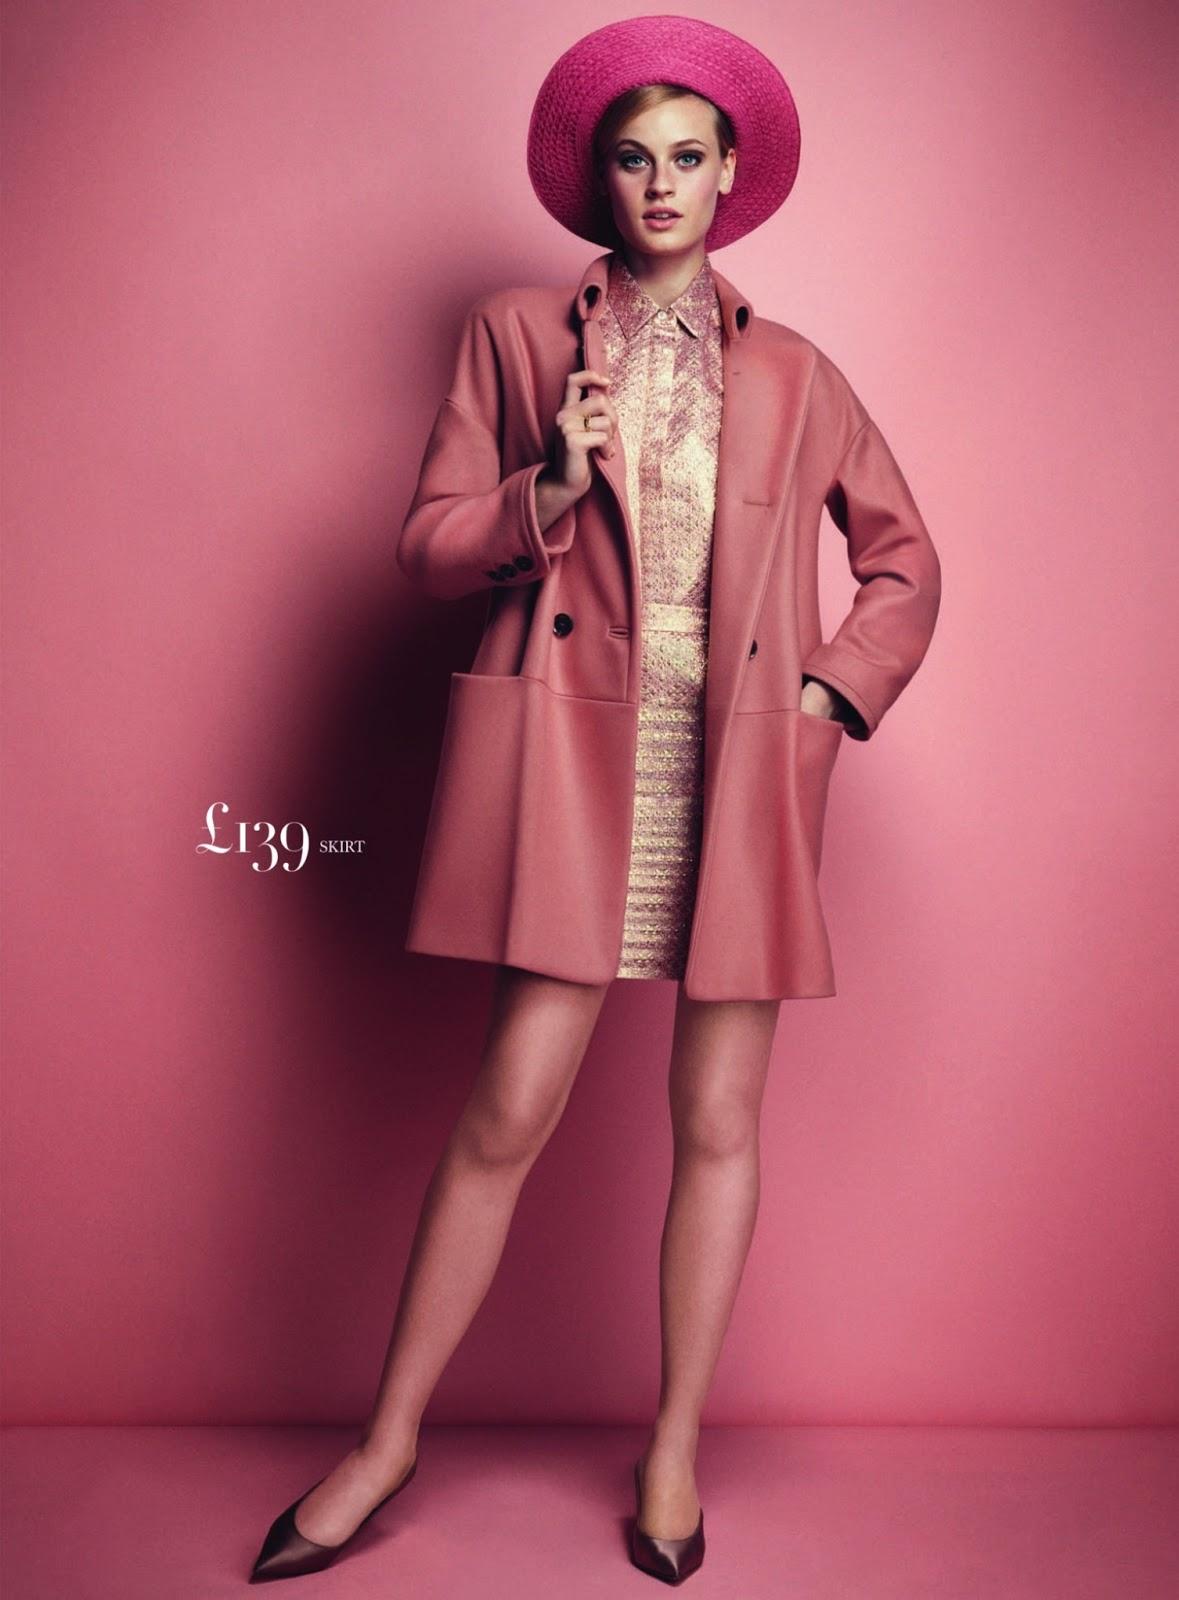 Pretty in pink Paulina Heiler By Dima Hohlov for Uk Harper's Bazaar3